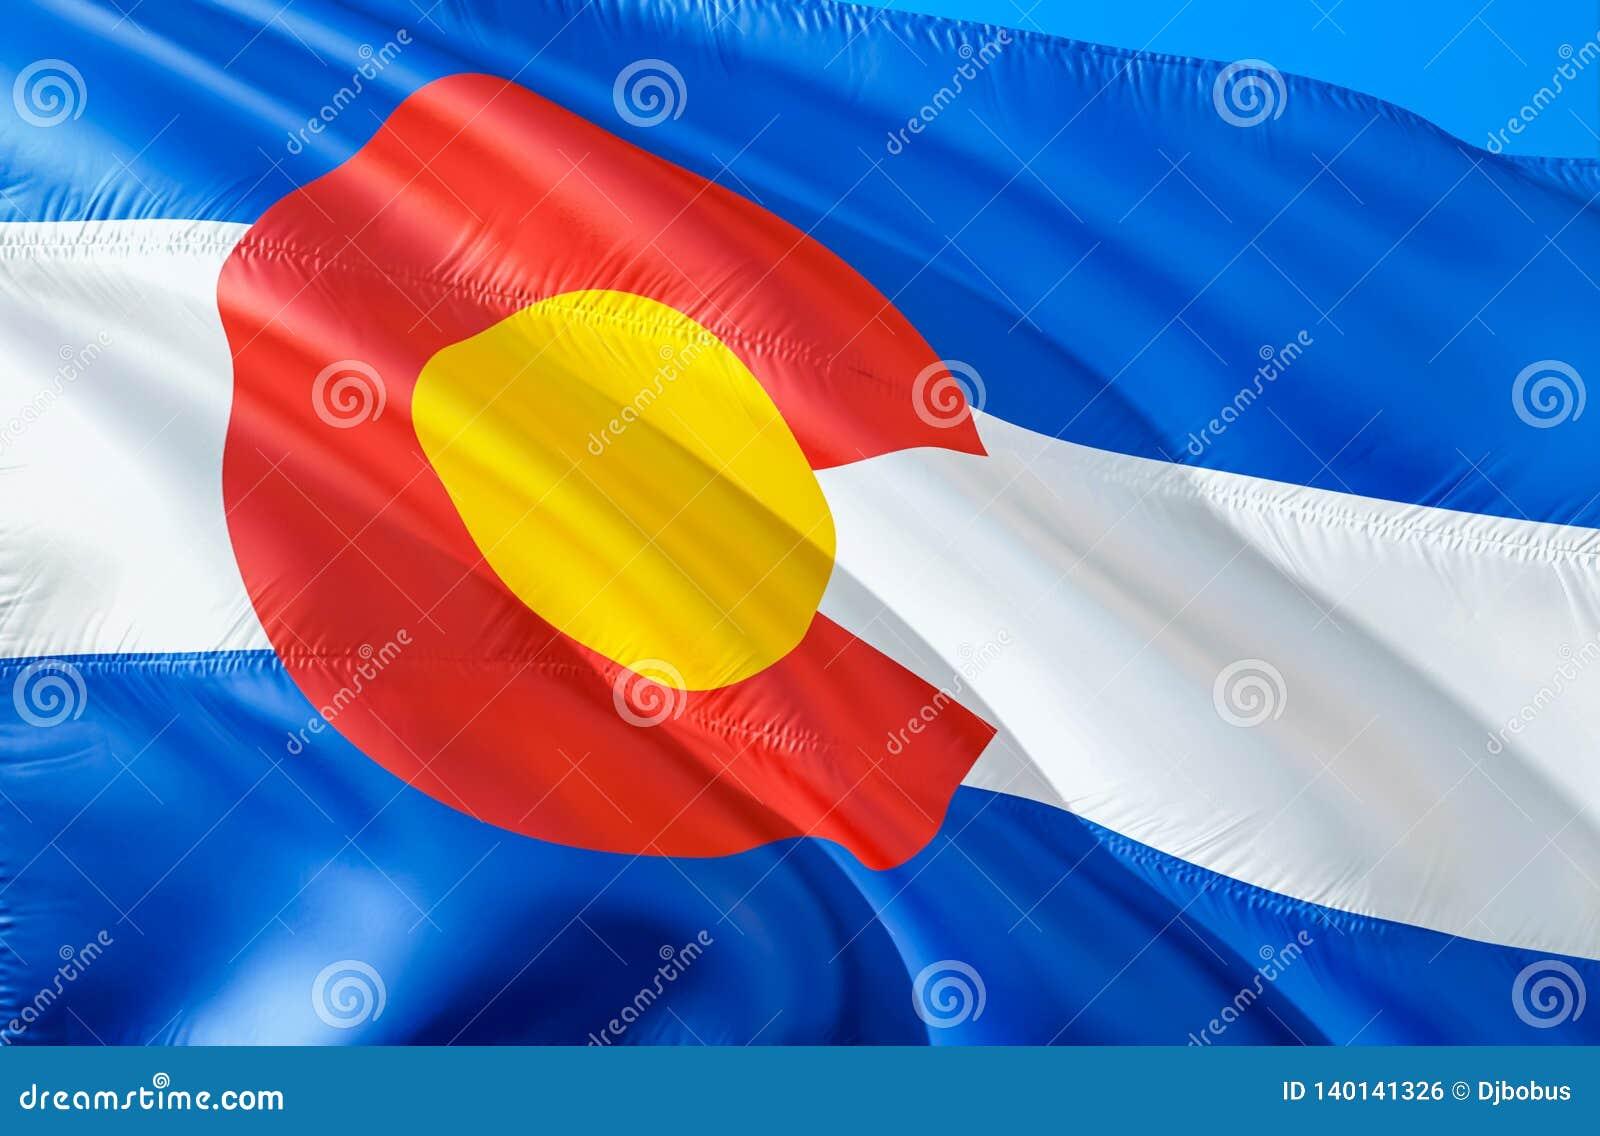 Kolorado flaga 3D falowania usa stanu flagi projekt Obywatel USA symbol Kolorado stan, 3D rendering Obywatelów kolory i